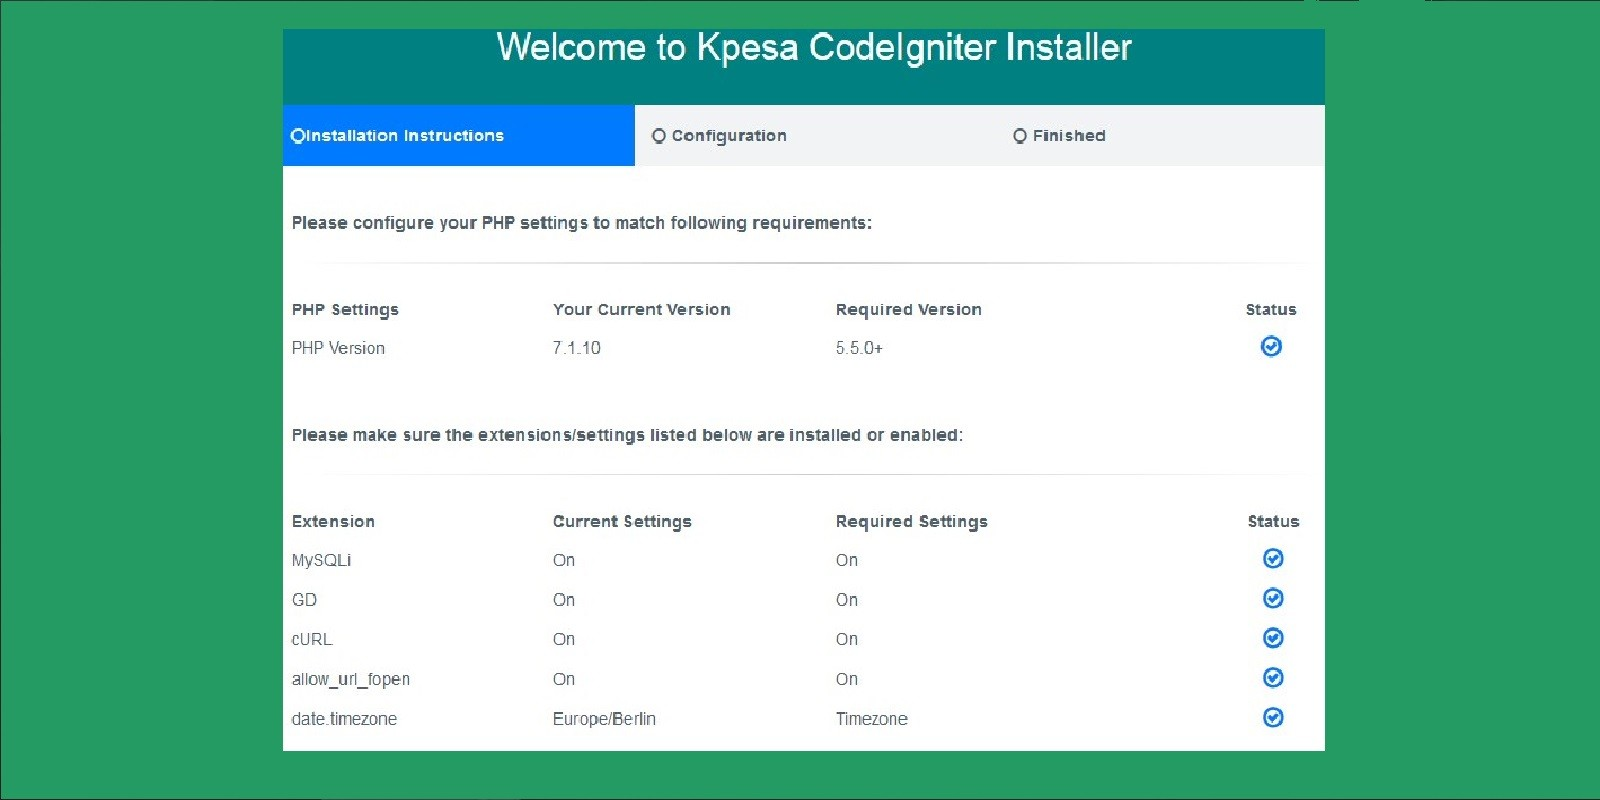 Kpesa CodeIgniter Installer